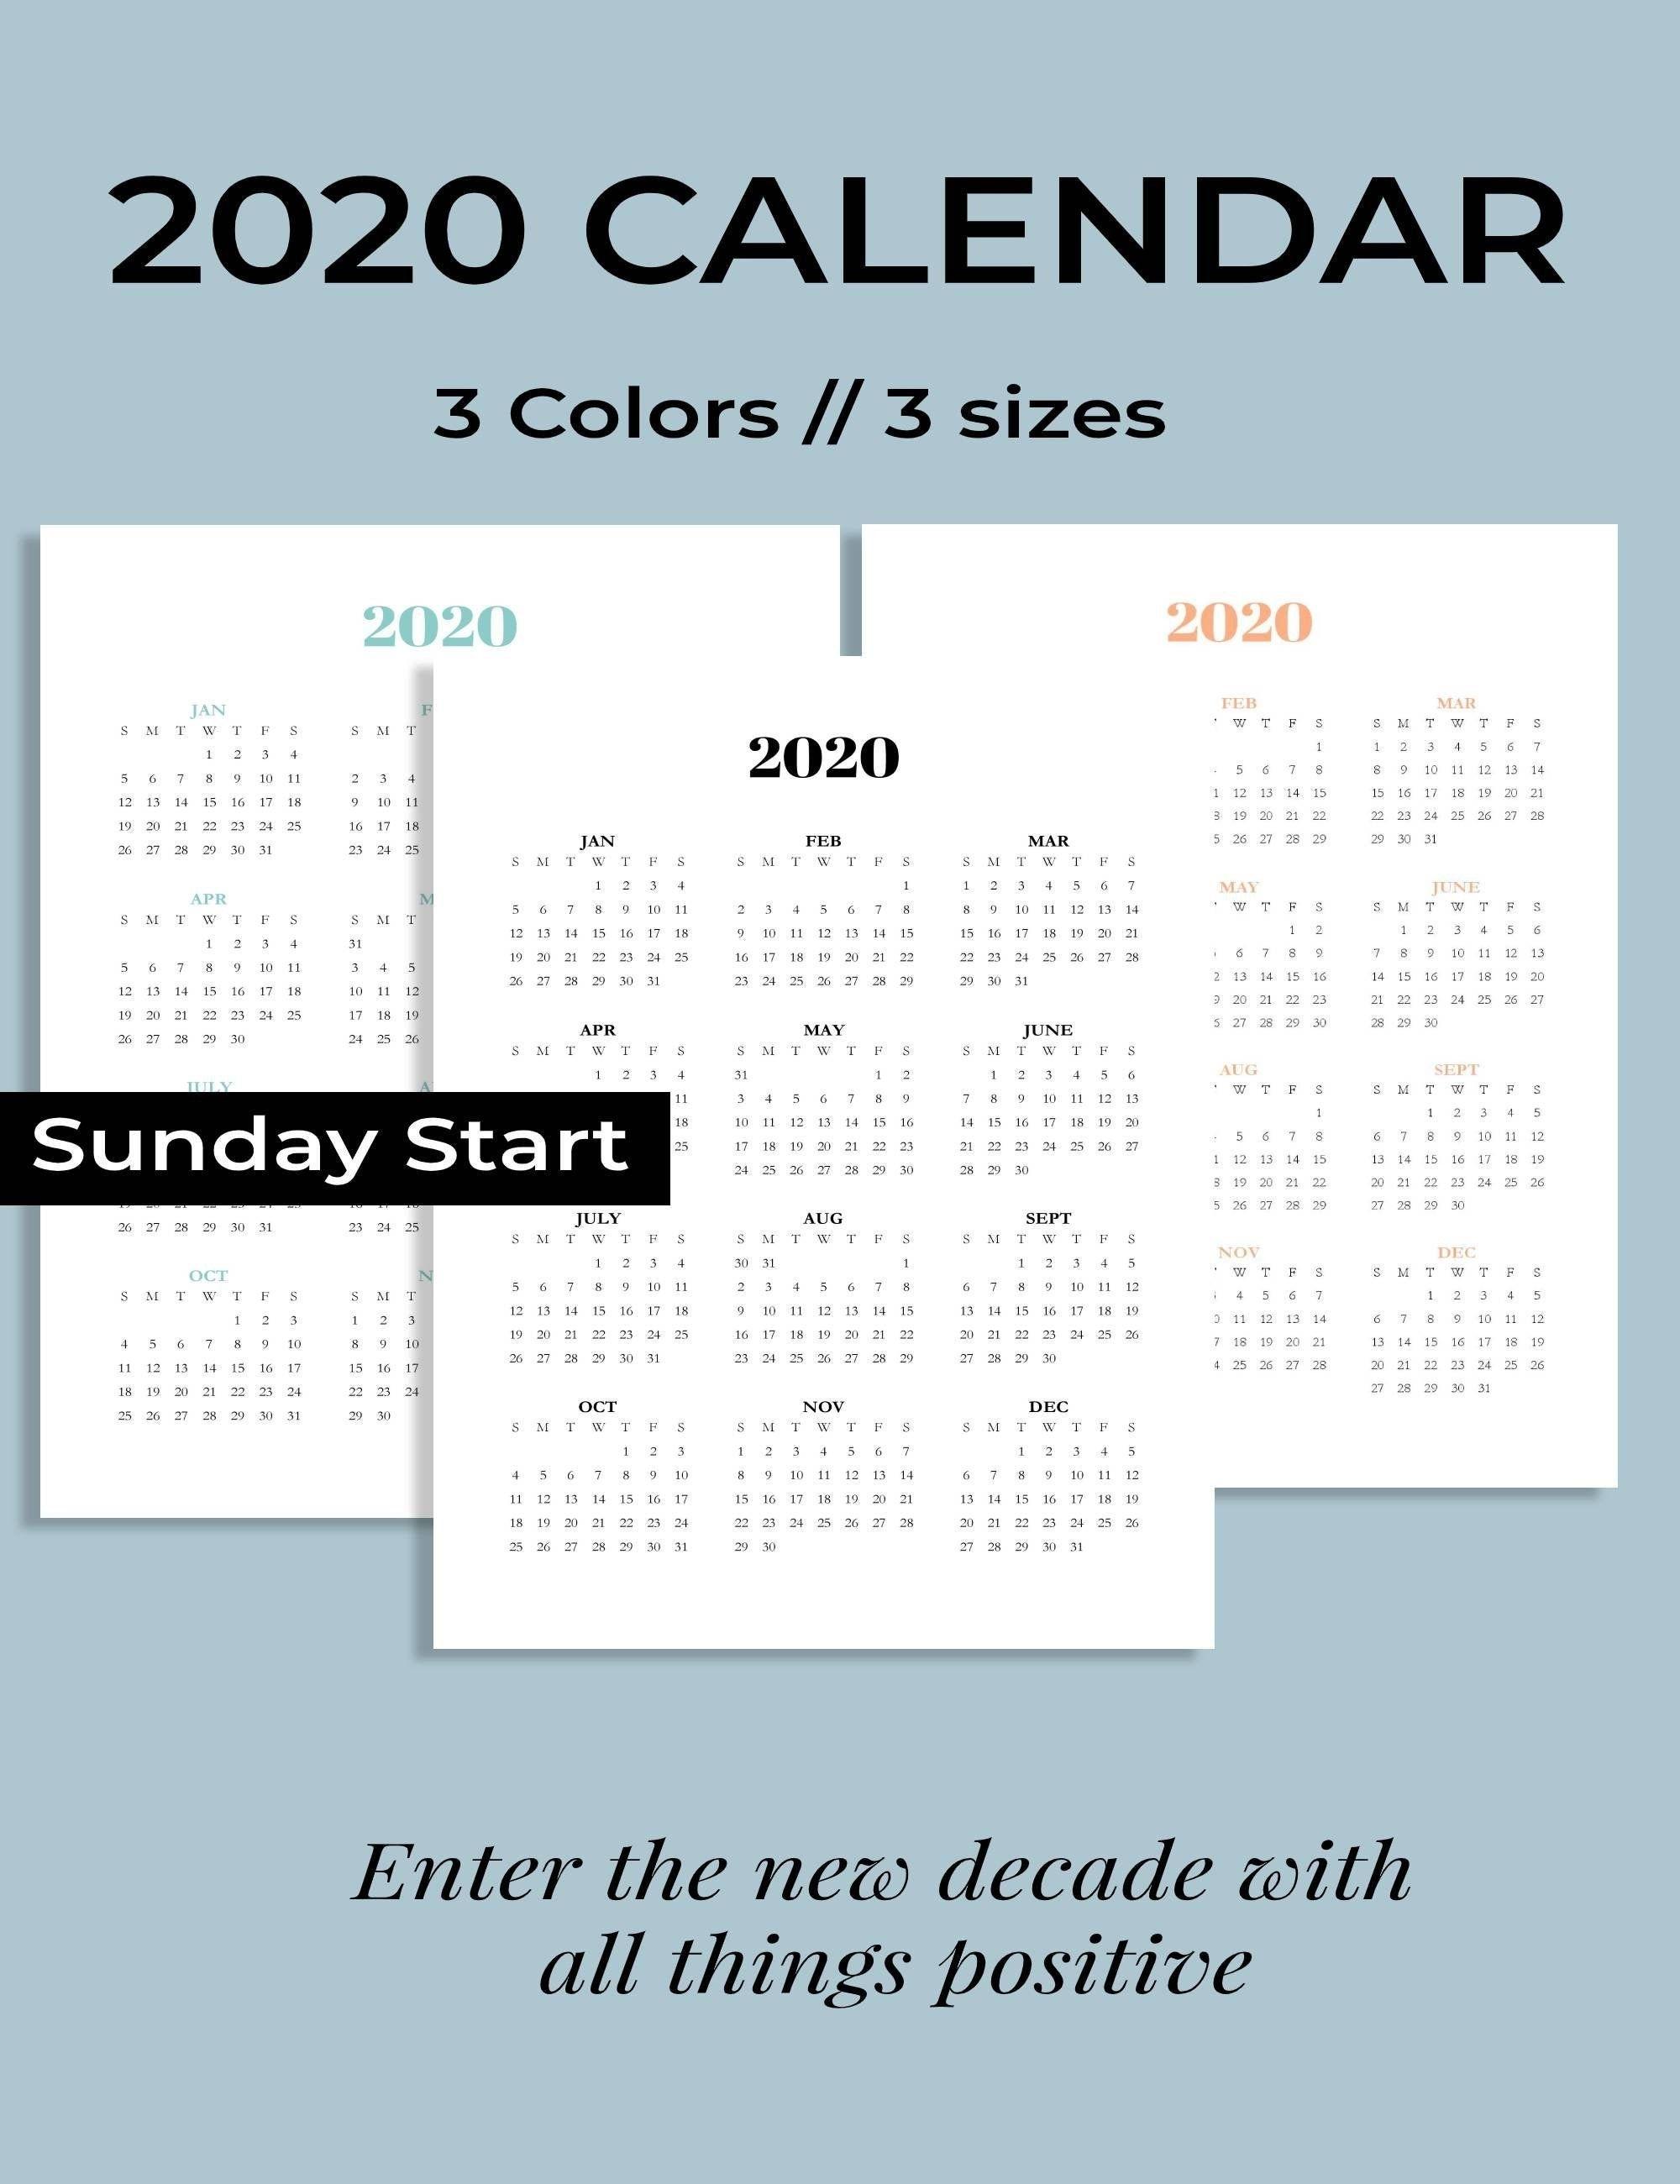 2020 Calendar Printable, Sunday Start 2020 Calendar, Year At within Bc Free 2020 At A Glance Calendar